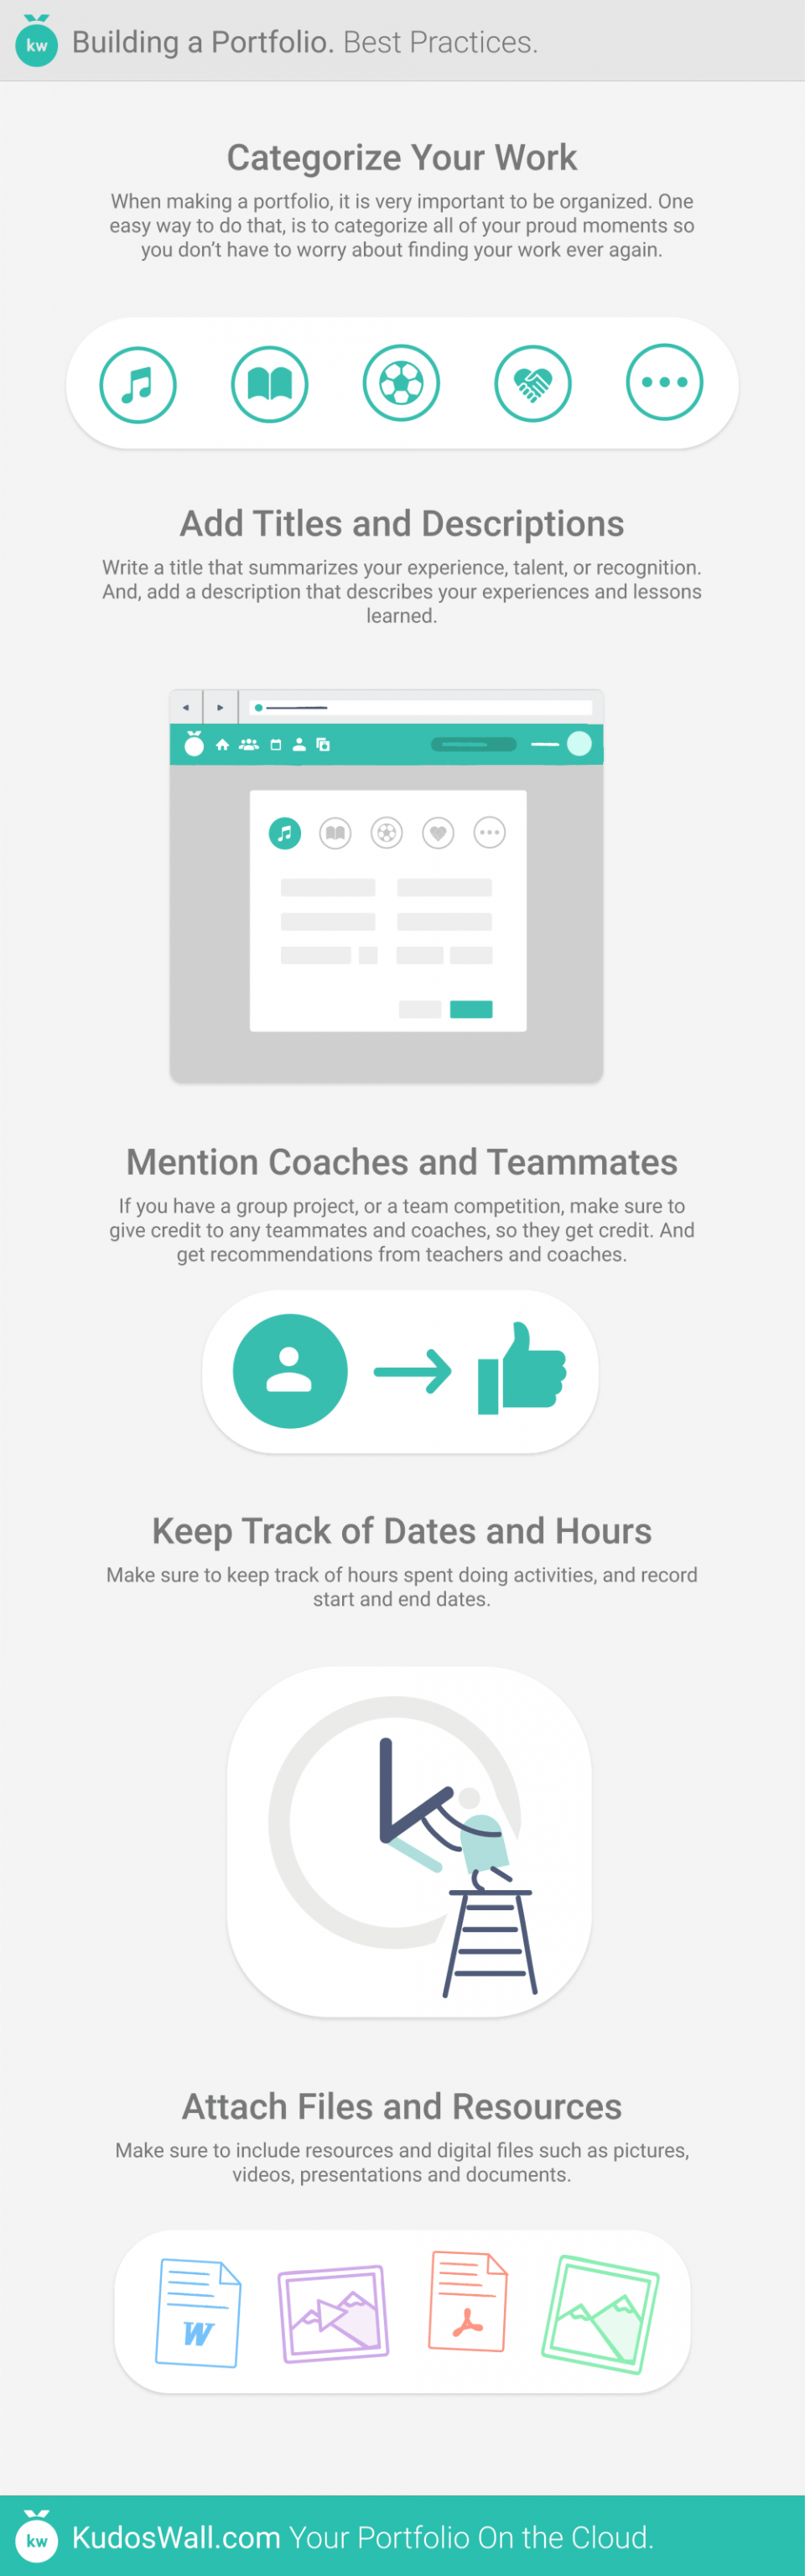 Digital Portfolios Best Practices Infographic